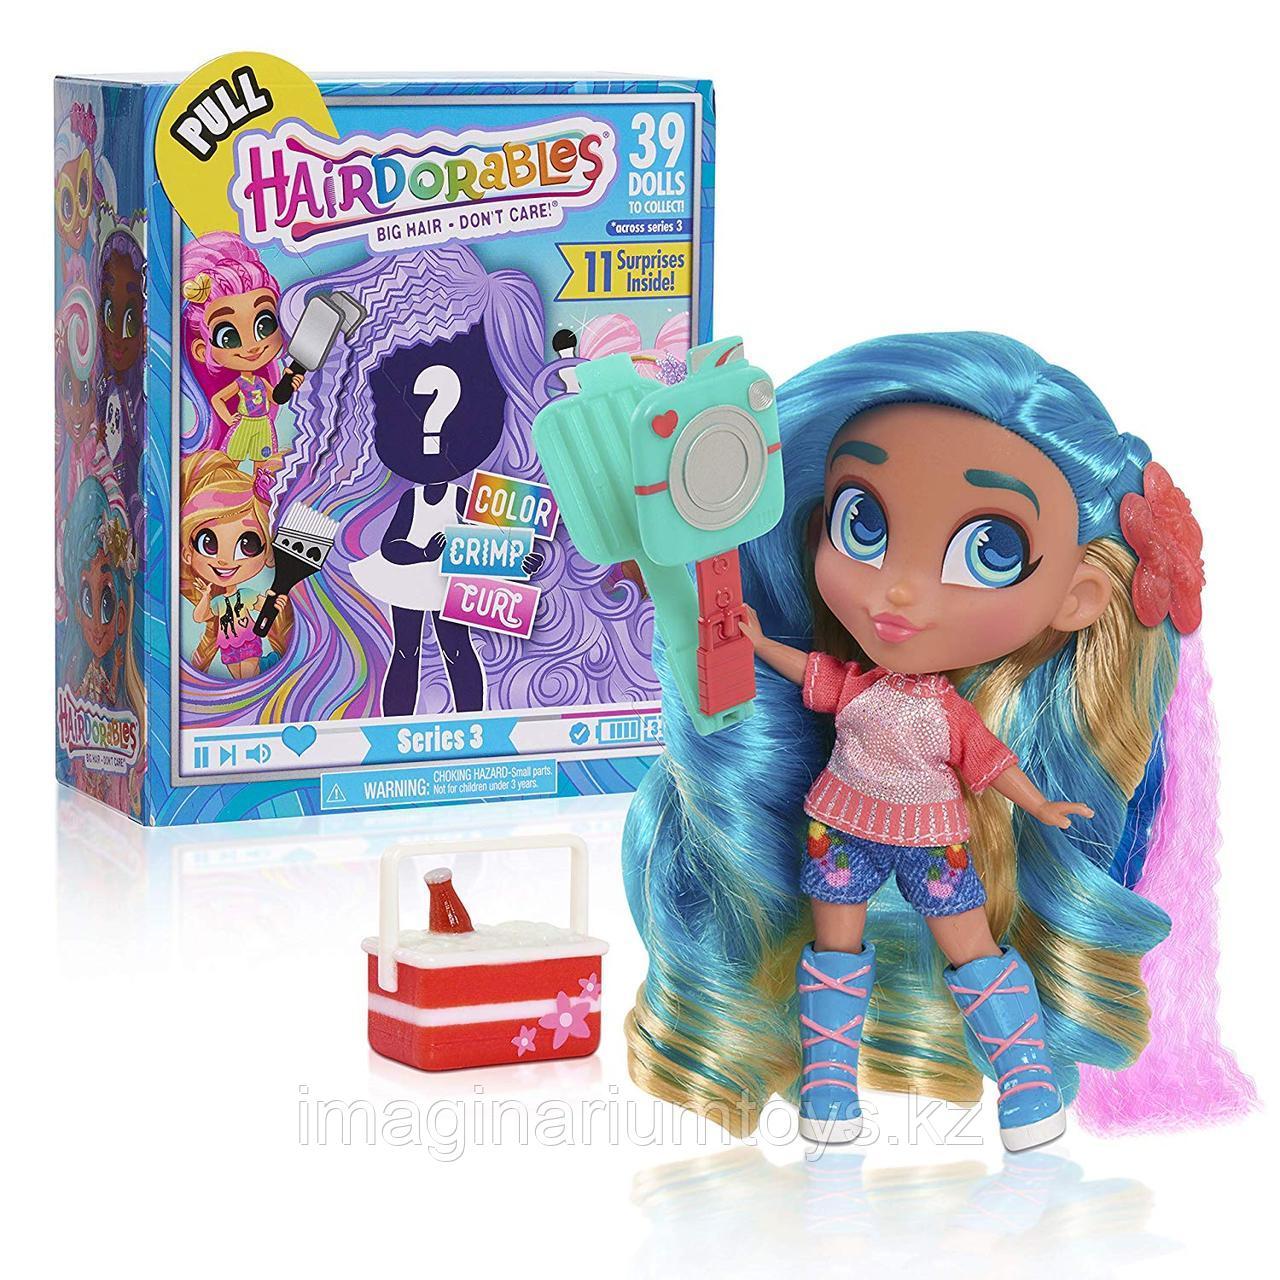 Кукла Hairdorables Хэрдораблс 3 серия